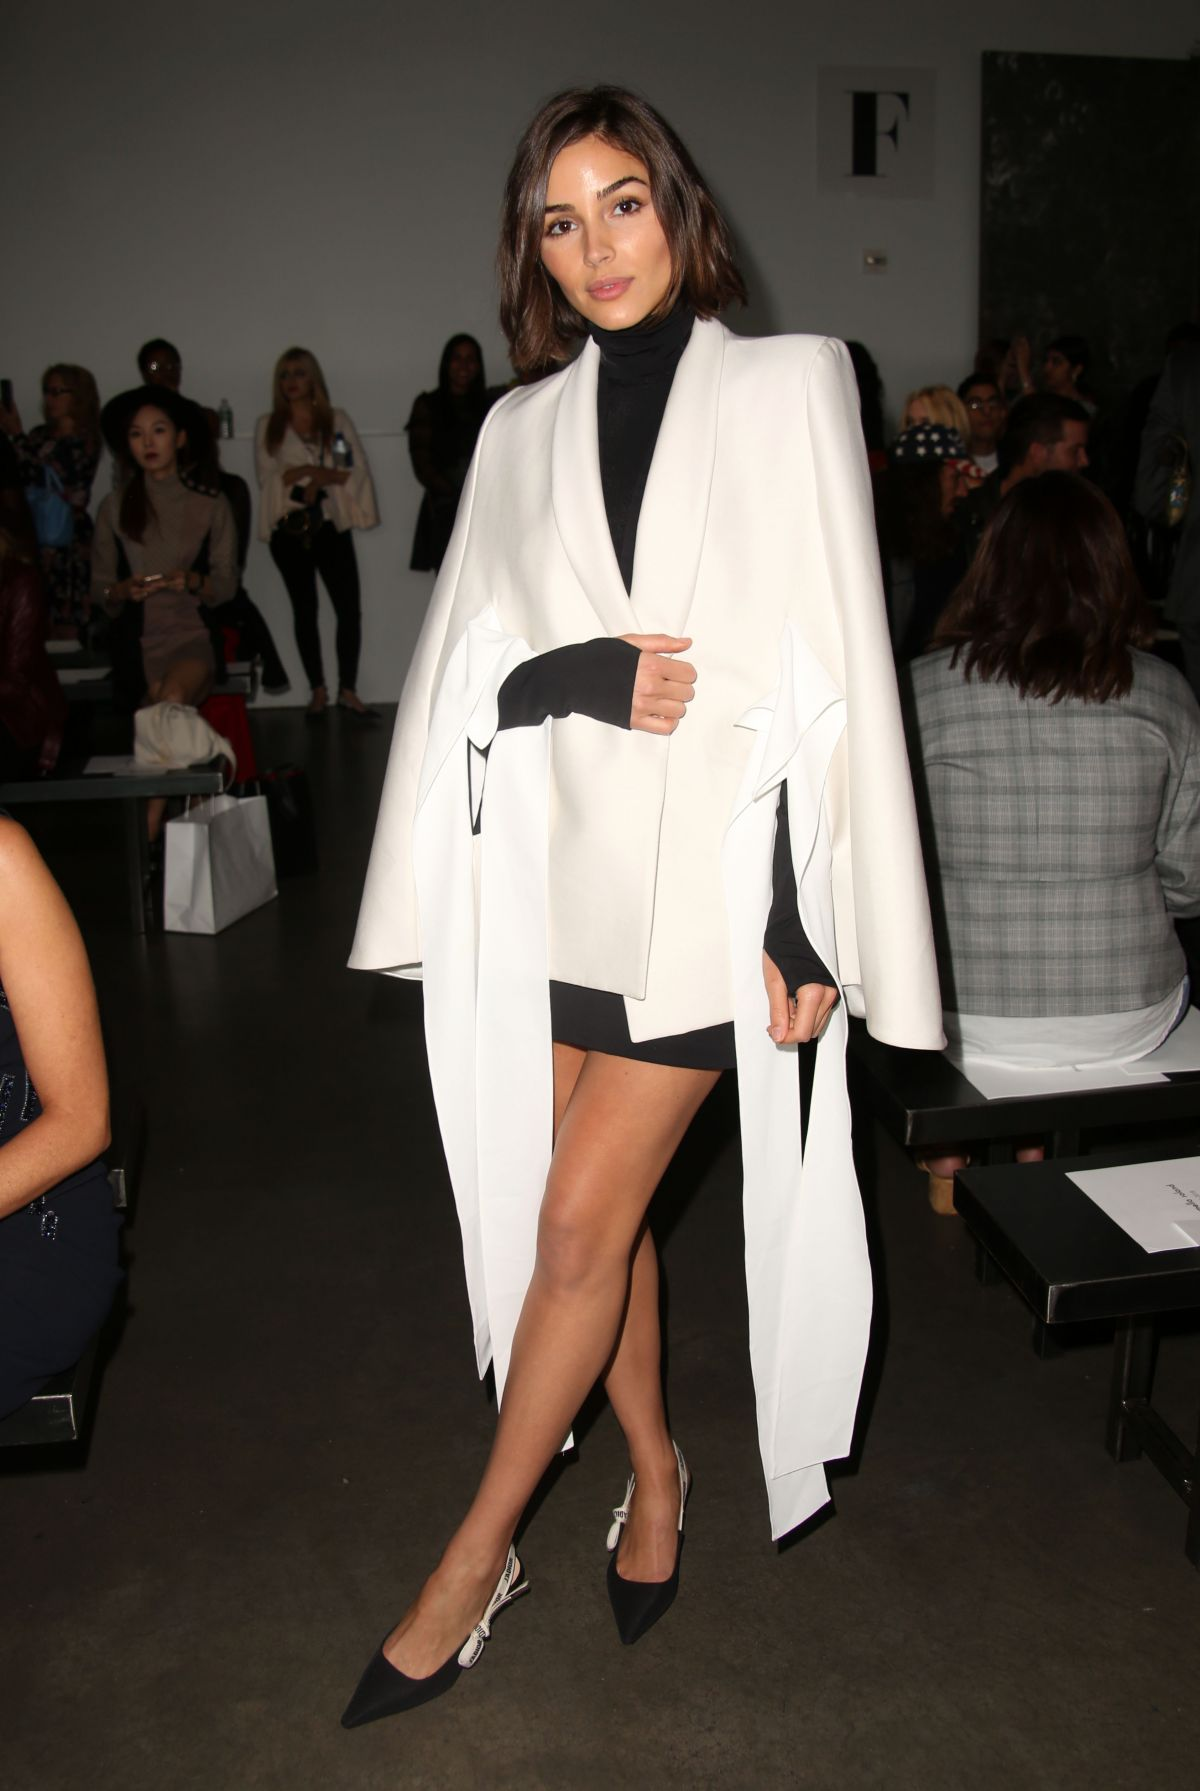 OLIVIA CULPO at Pamella Roland Fashion Show at New York Fashion Week 09/06/2017